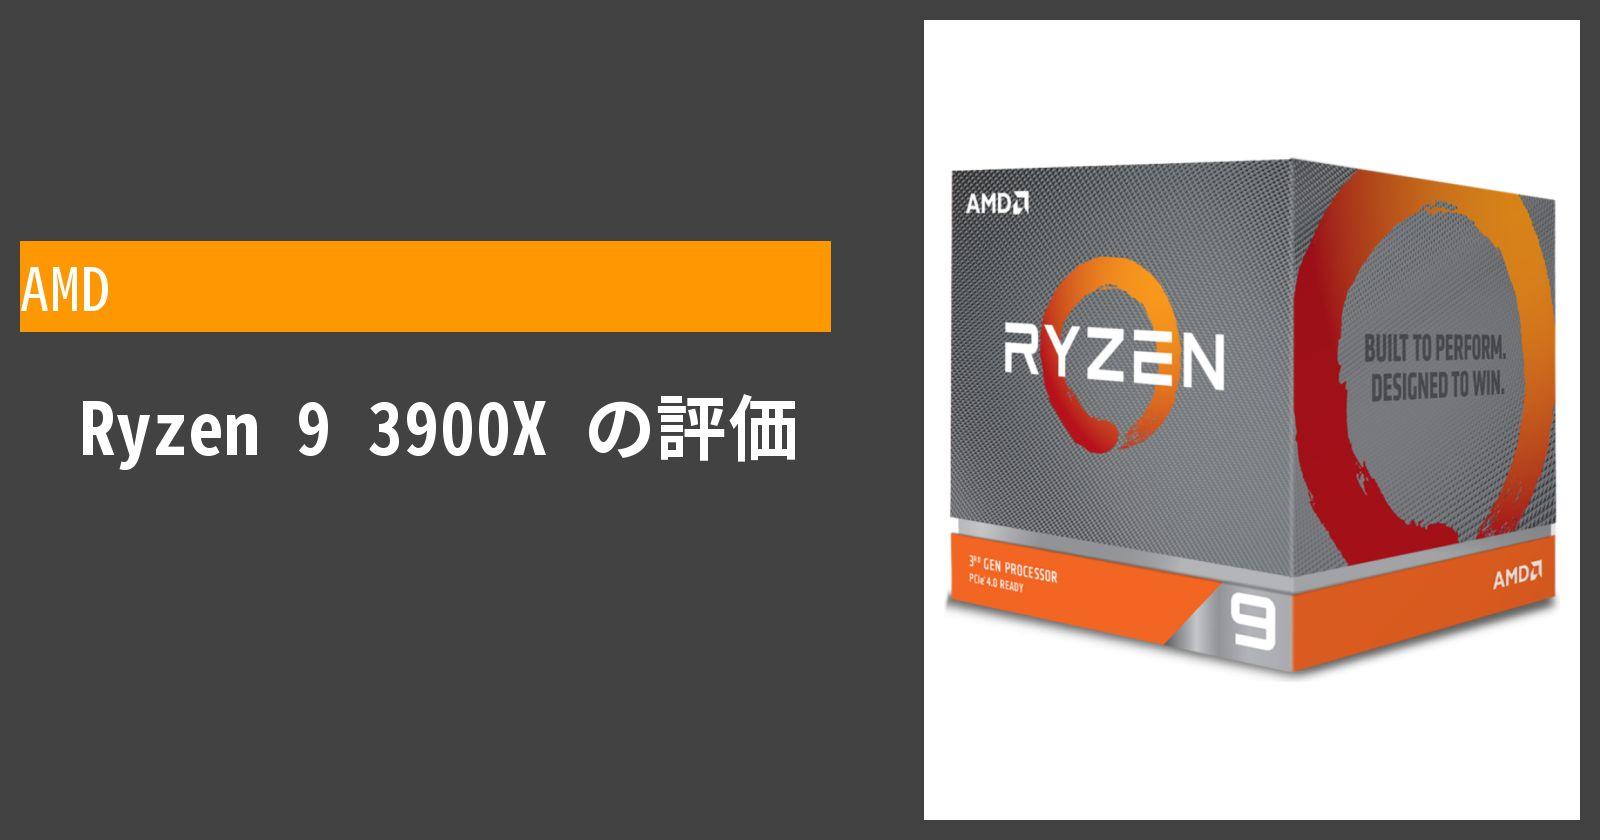 Ryzen 9 3900Xを徹底評価